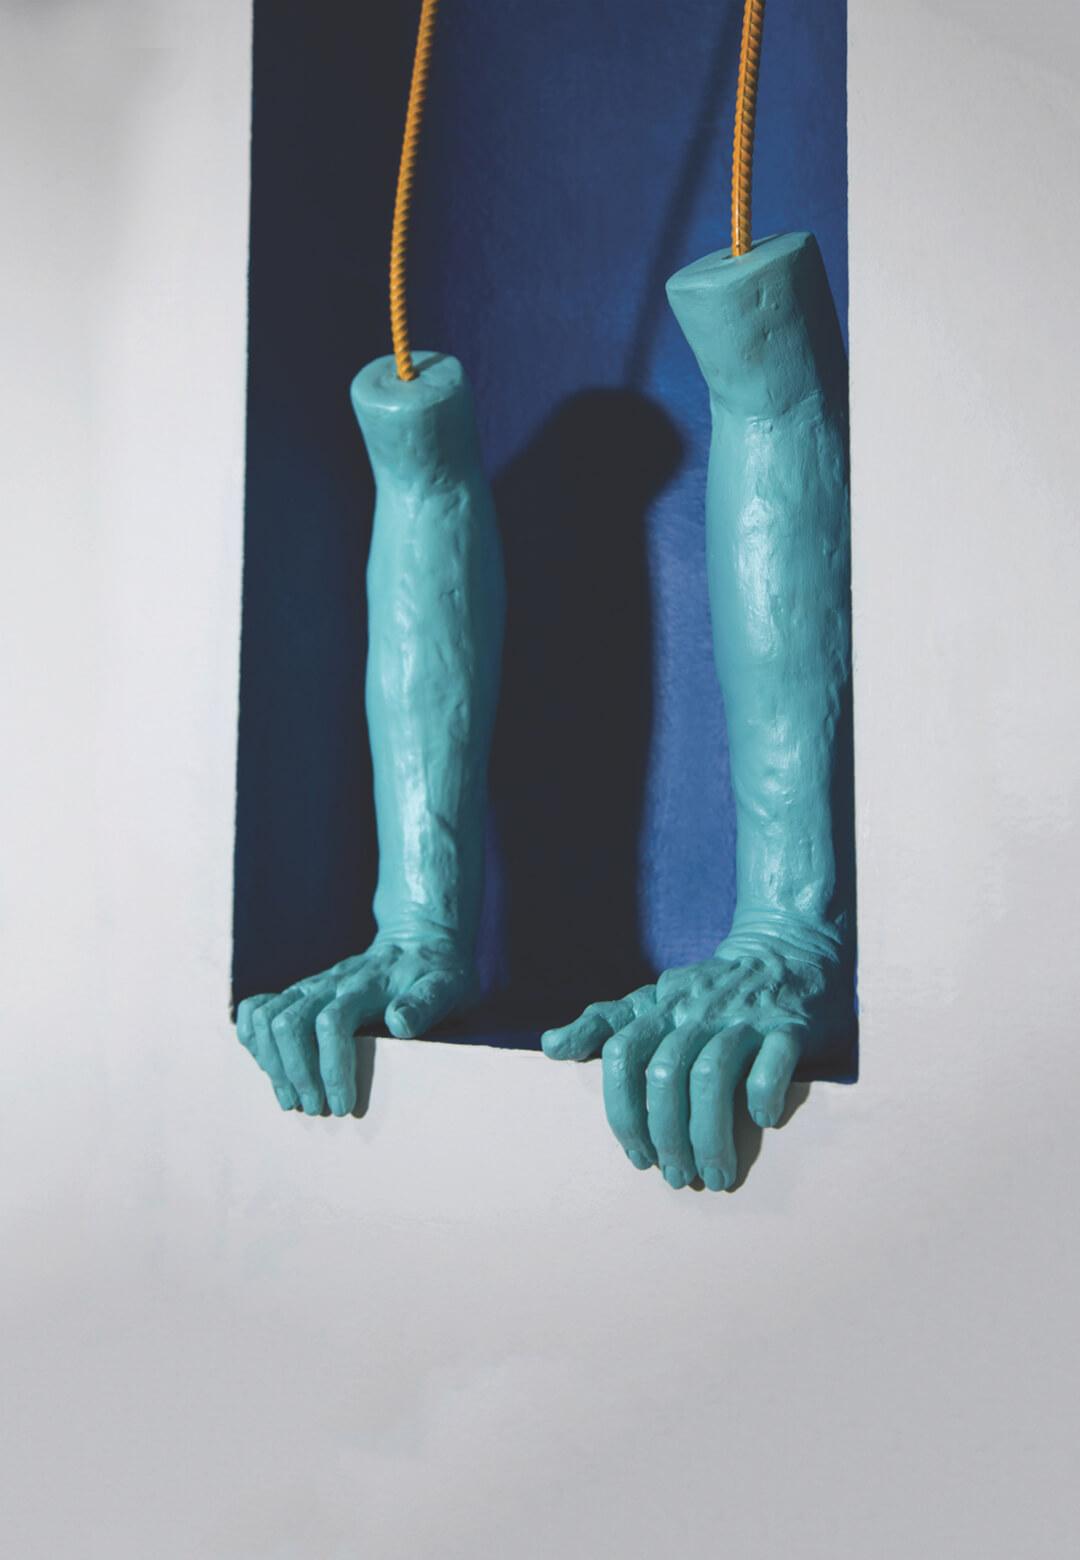 Loosen Your Grip, a work by artist Rebecca Frantz   Rebecca Frantz   USA   STIRworld